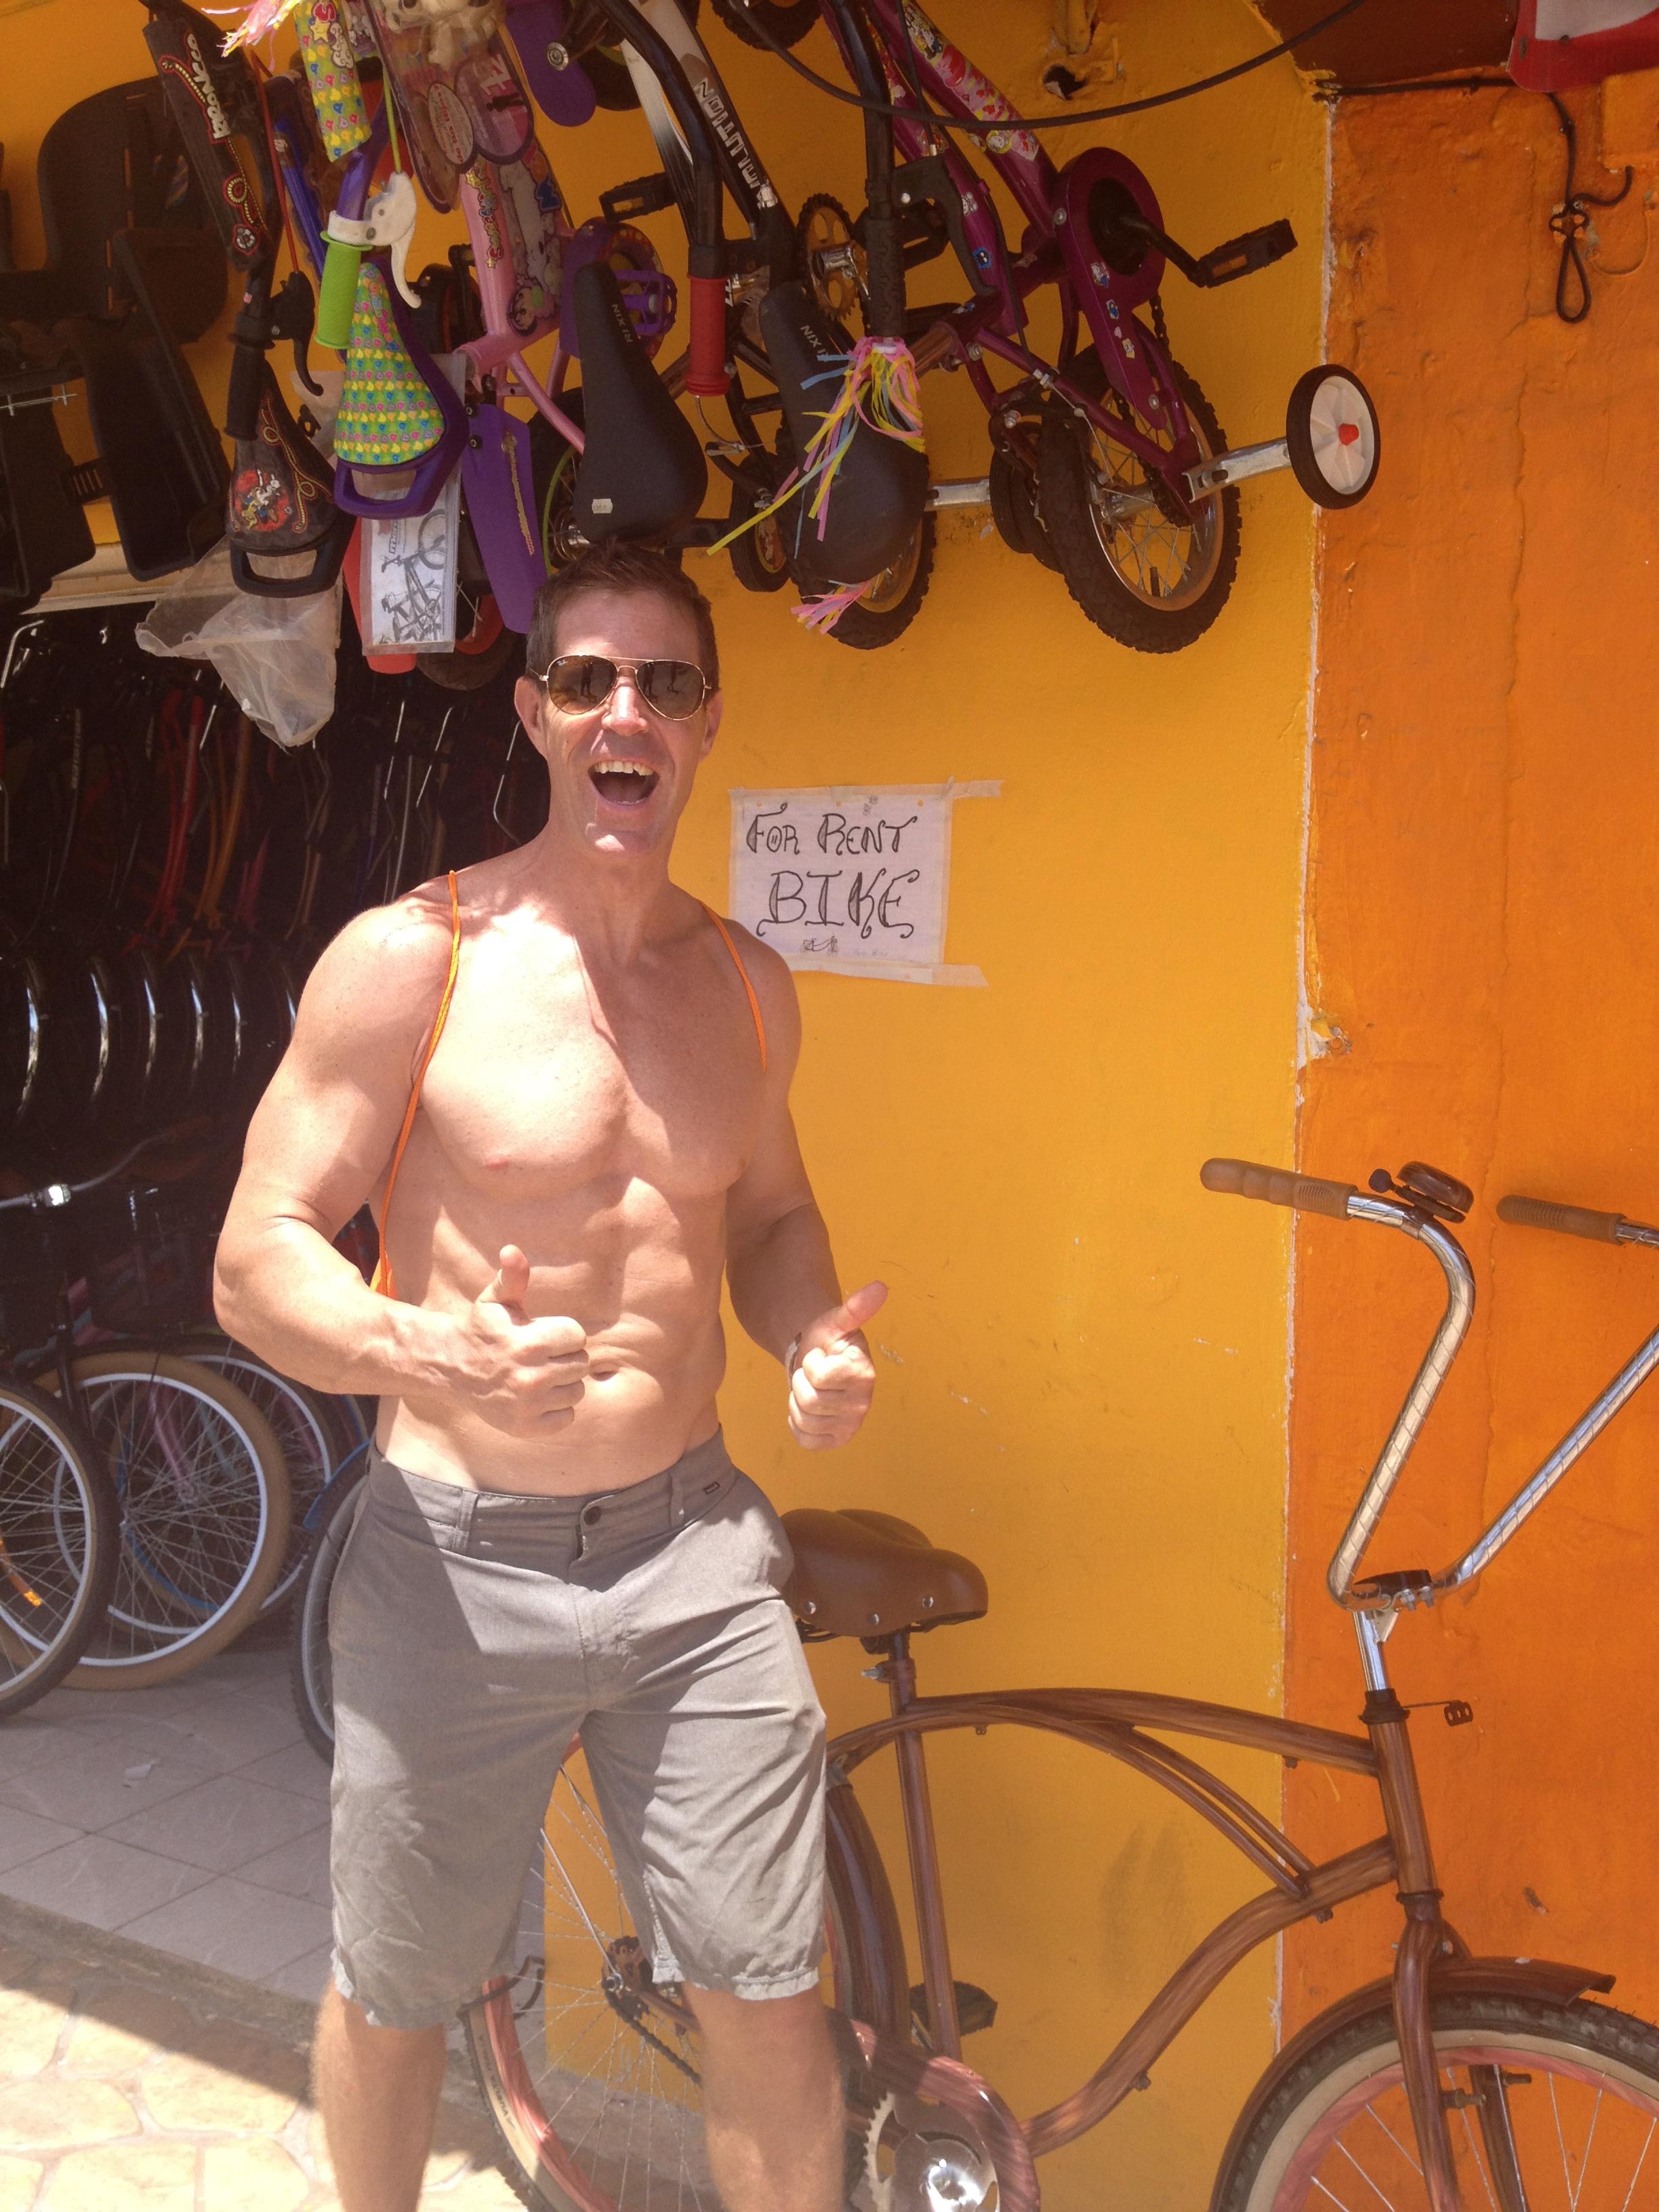 rent your bike playarida.com